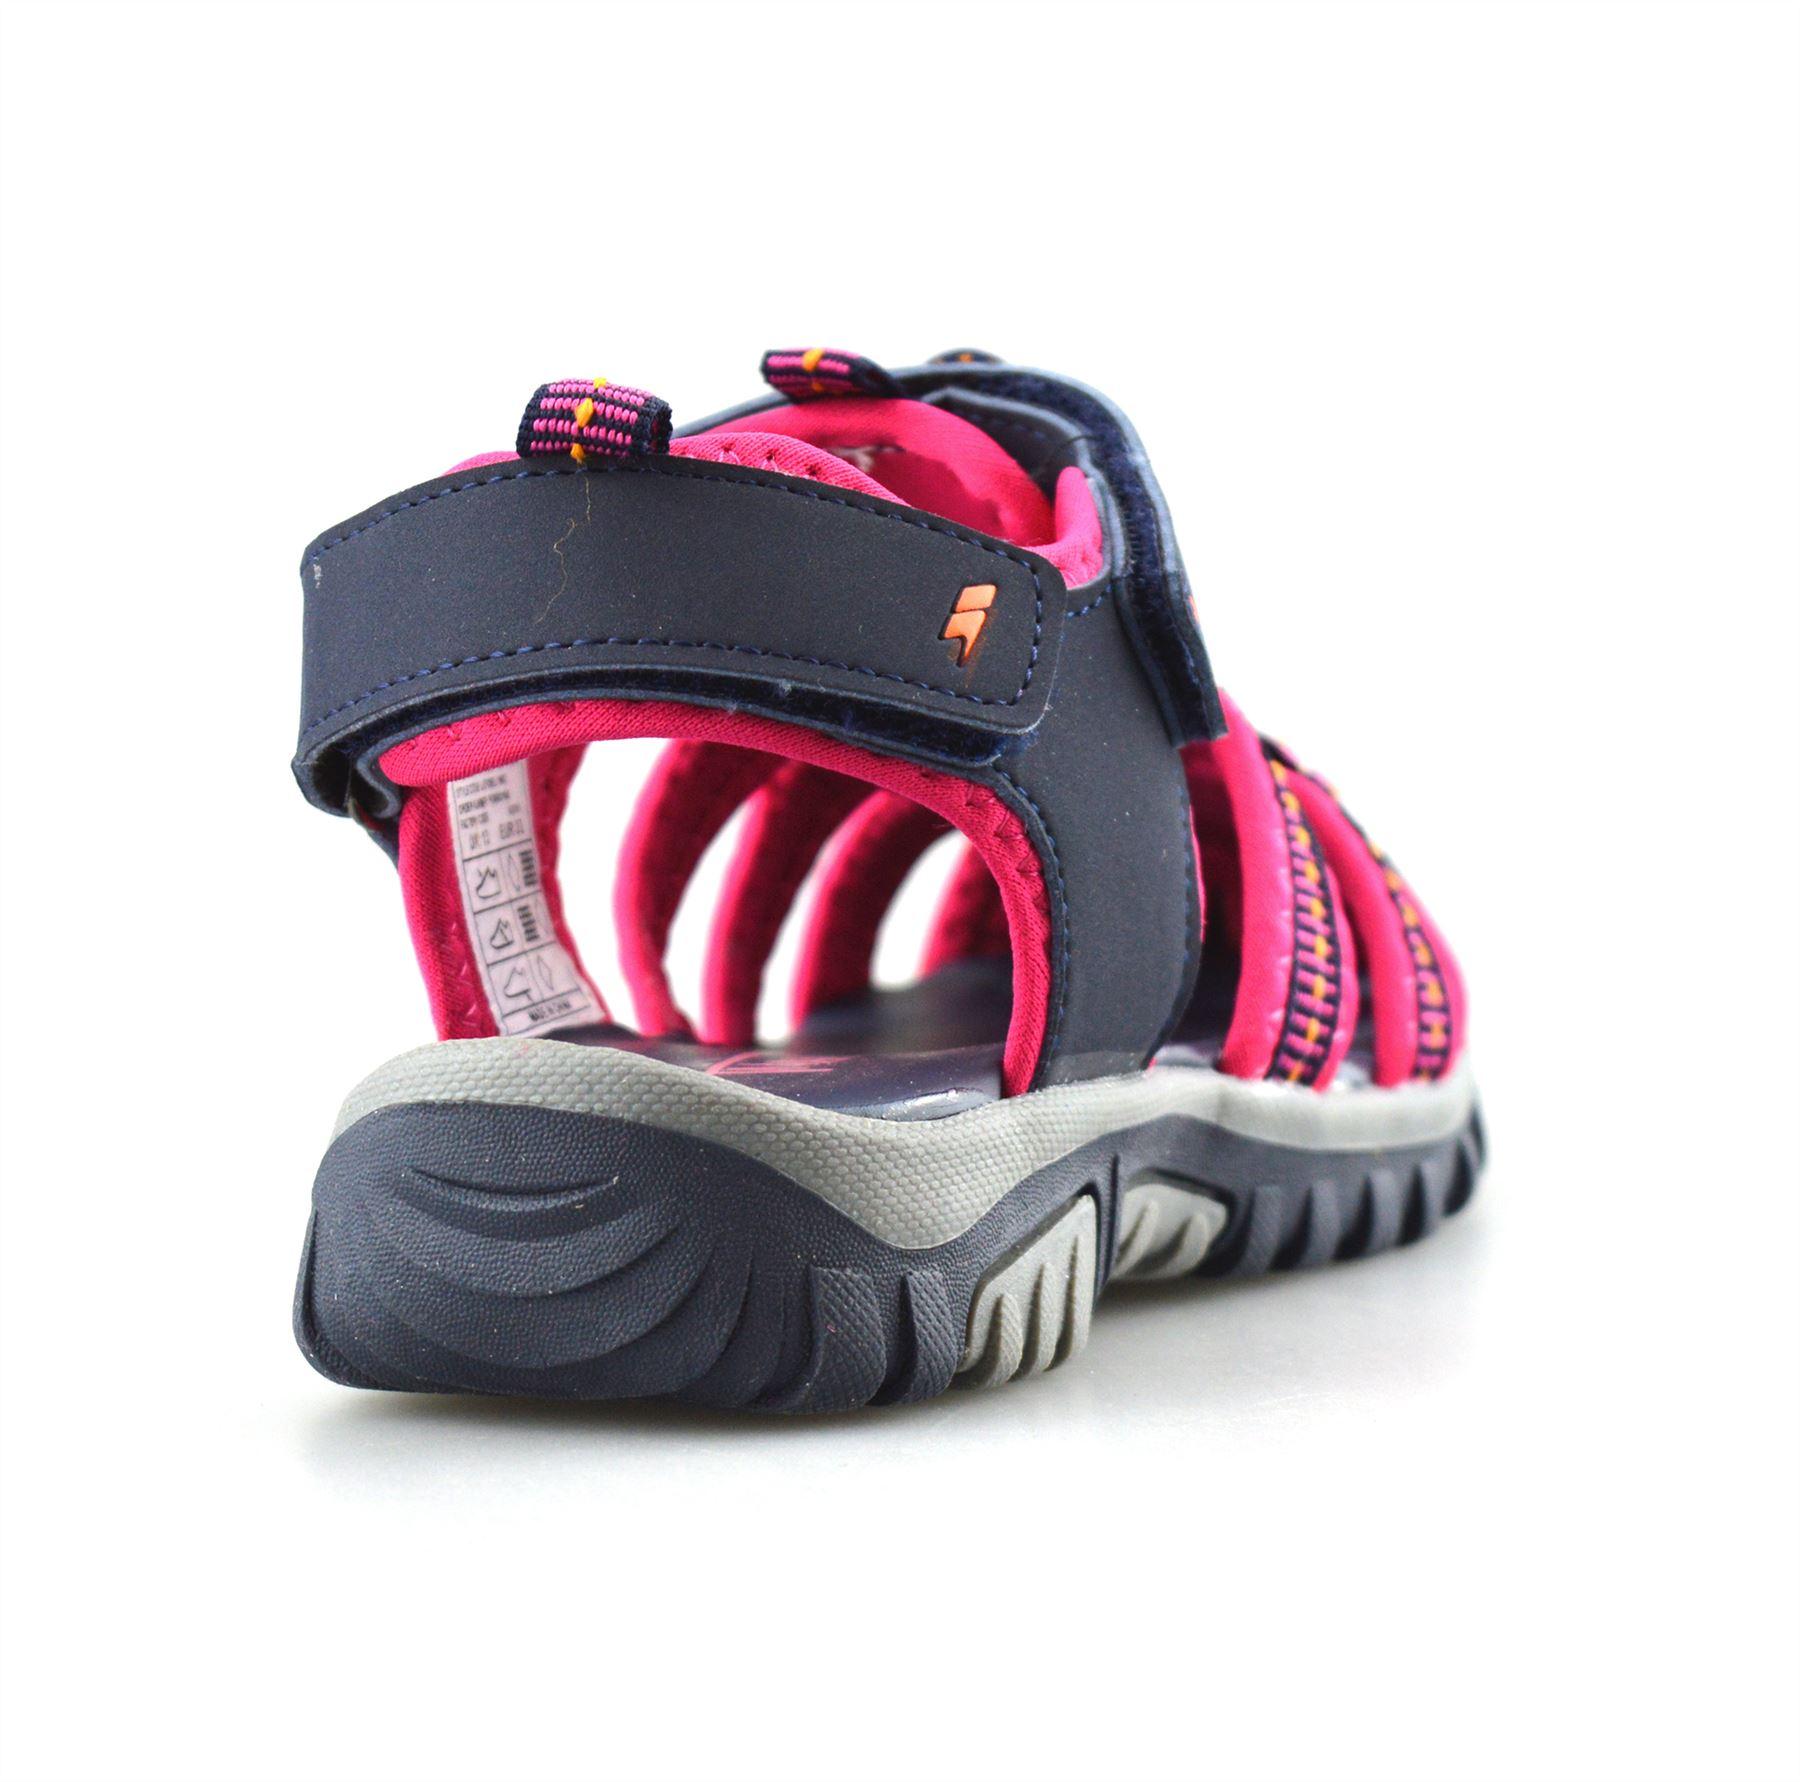 Boys-Girls-Kids-Trespass-Summer-Beach-Casual-Walking-Sports-Sandals-Shoes-Size thumbnail 30